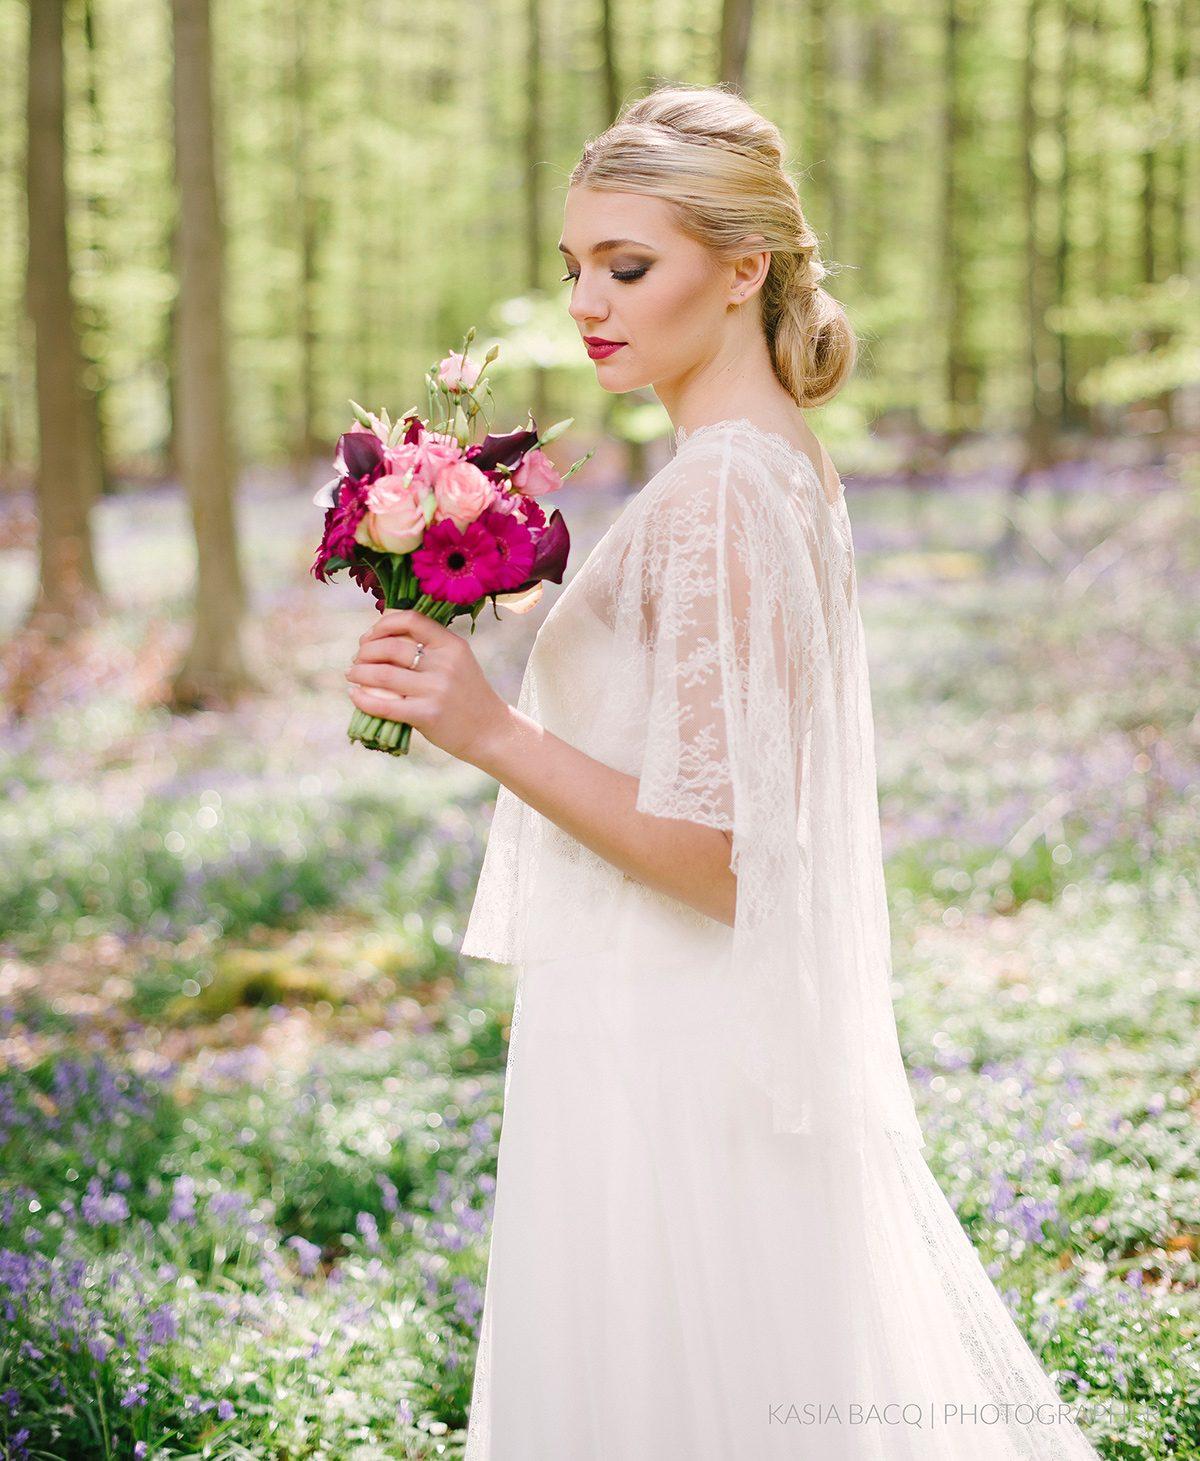 Blue-Fairy-Forest-Bridal-Shoot-Kasia-Bacq-09